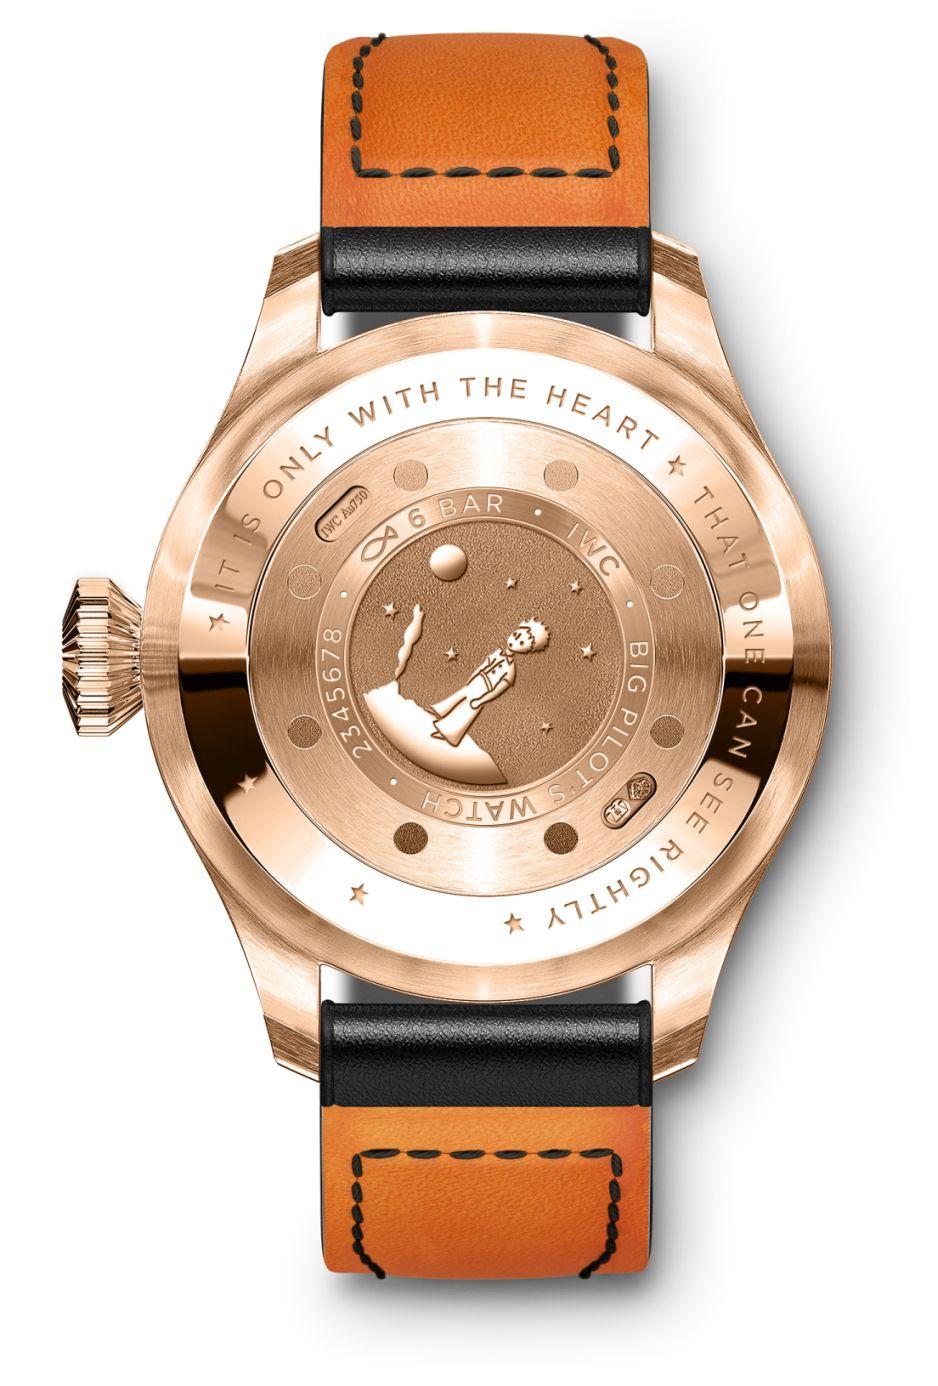 IWC Bradley Cooper Oscars, Bradley Cooper Oscars wristwatch, Bradley Cooper charity